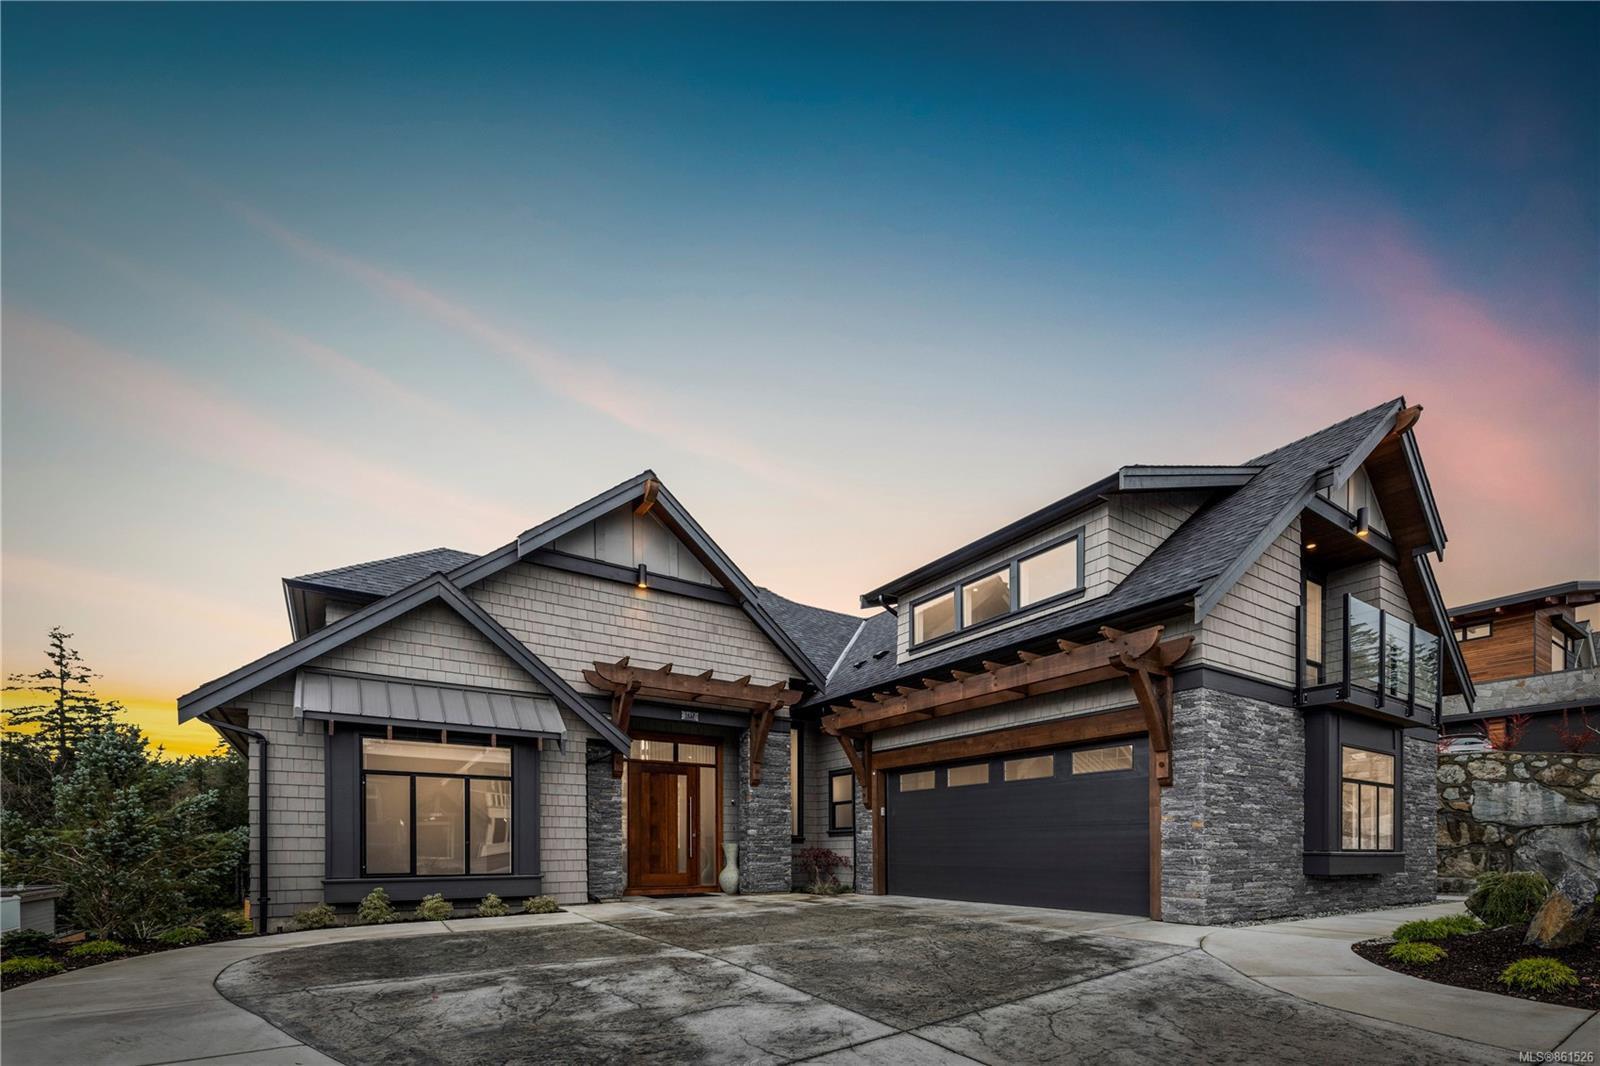 Main Photo: 1457 Pebble Pl in : La Bear Mountain House for sale (Langford)  : MLS®# 861526